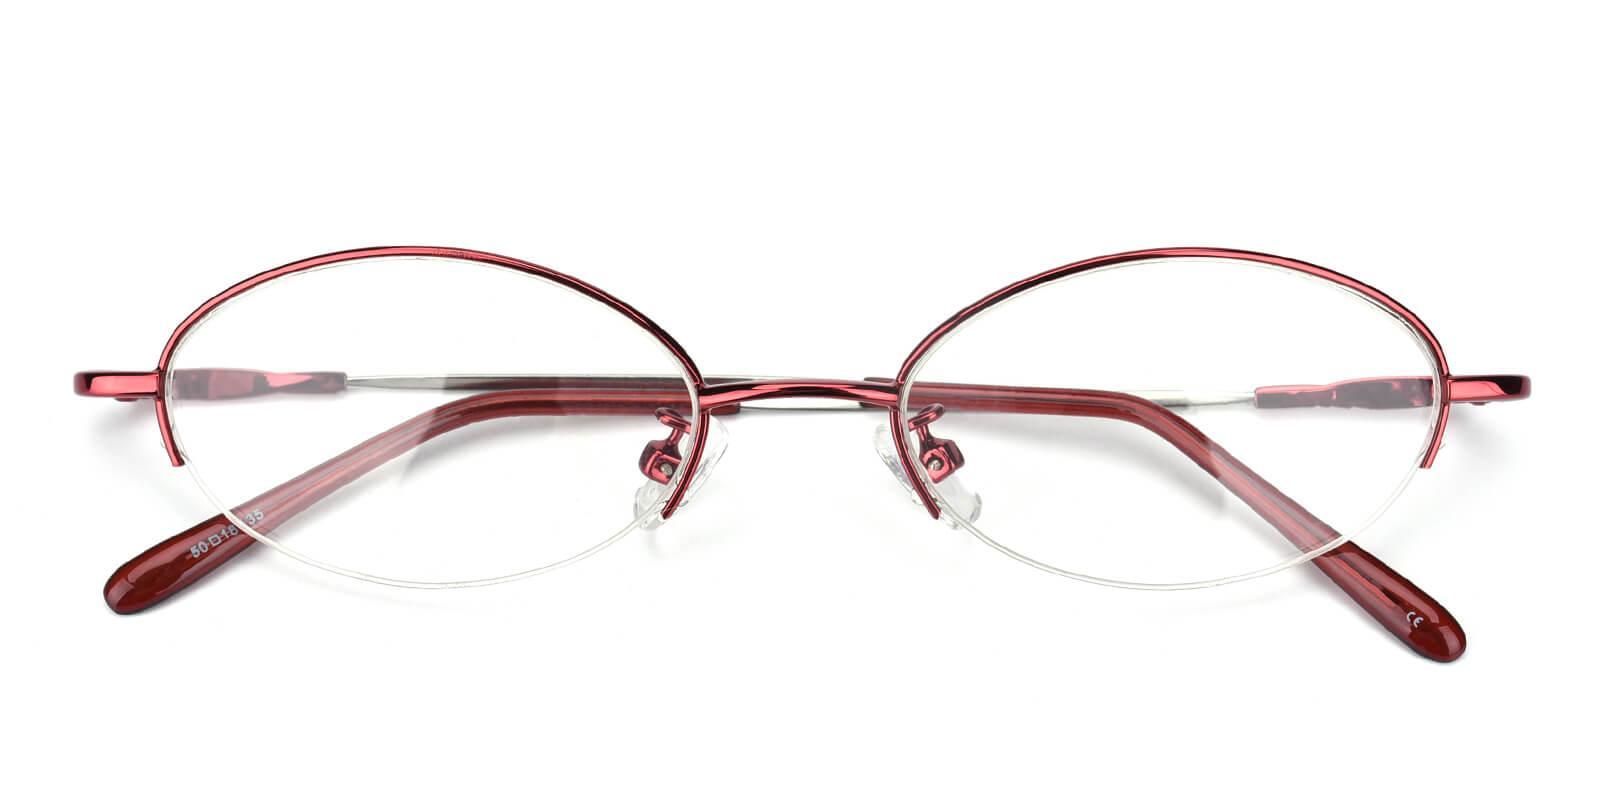 Anthony-Red-Oval-Metal-Eyeglasses-detail